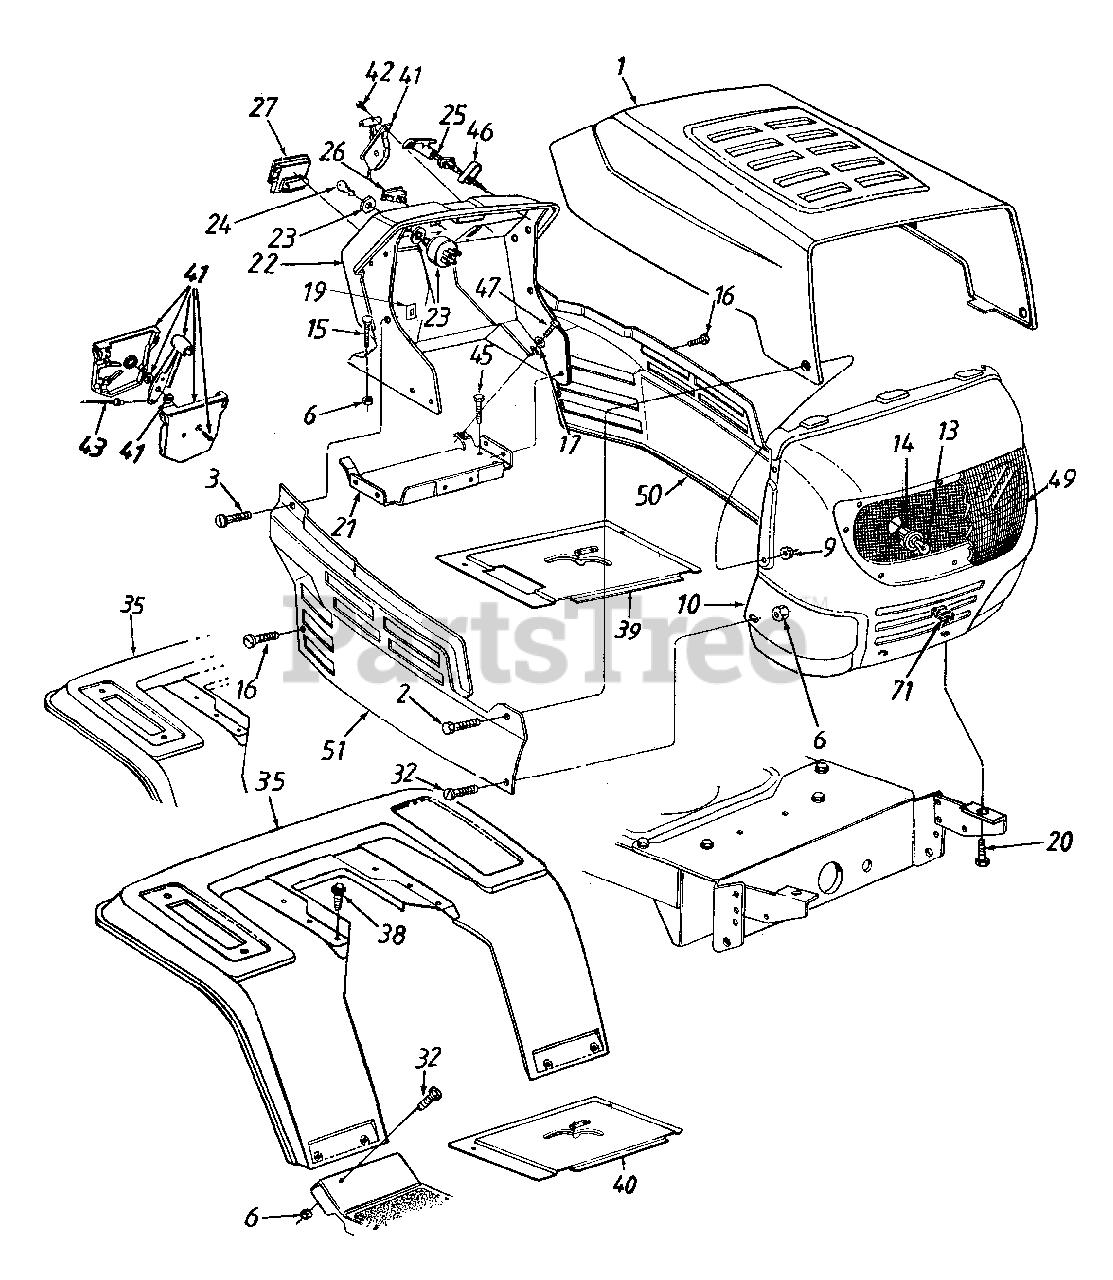 Huskee 13a G131